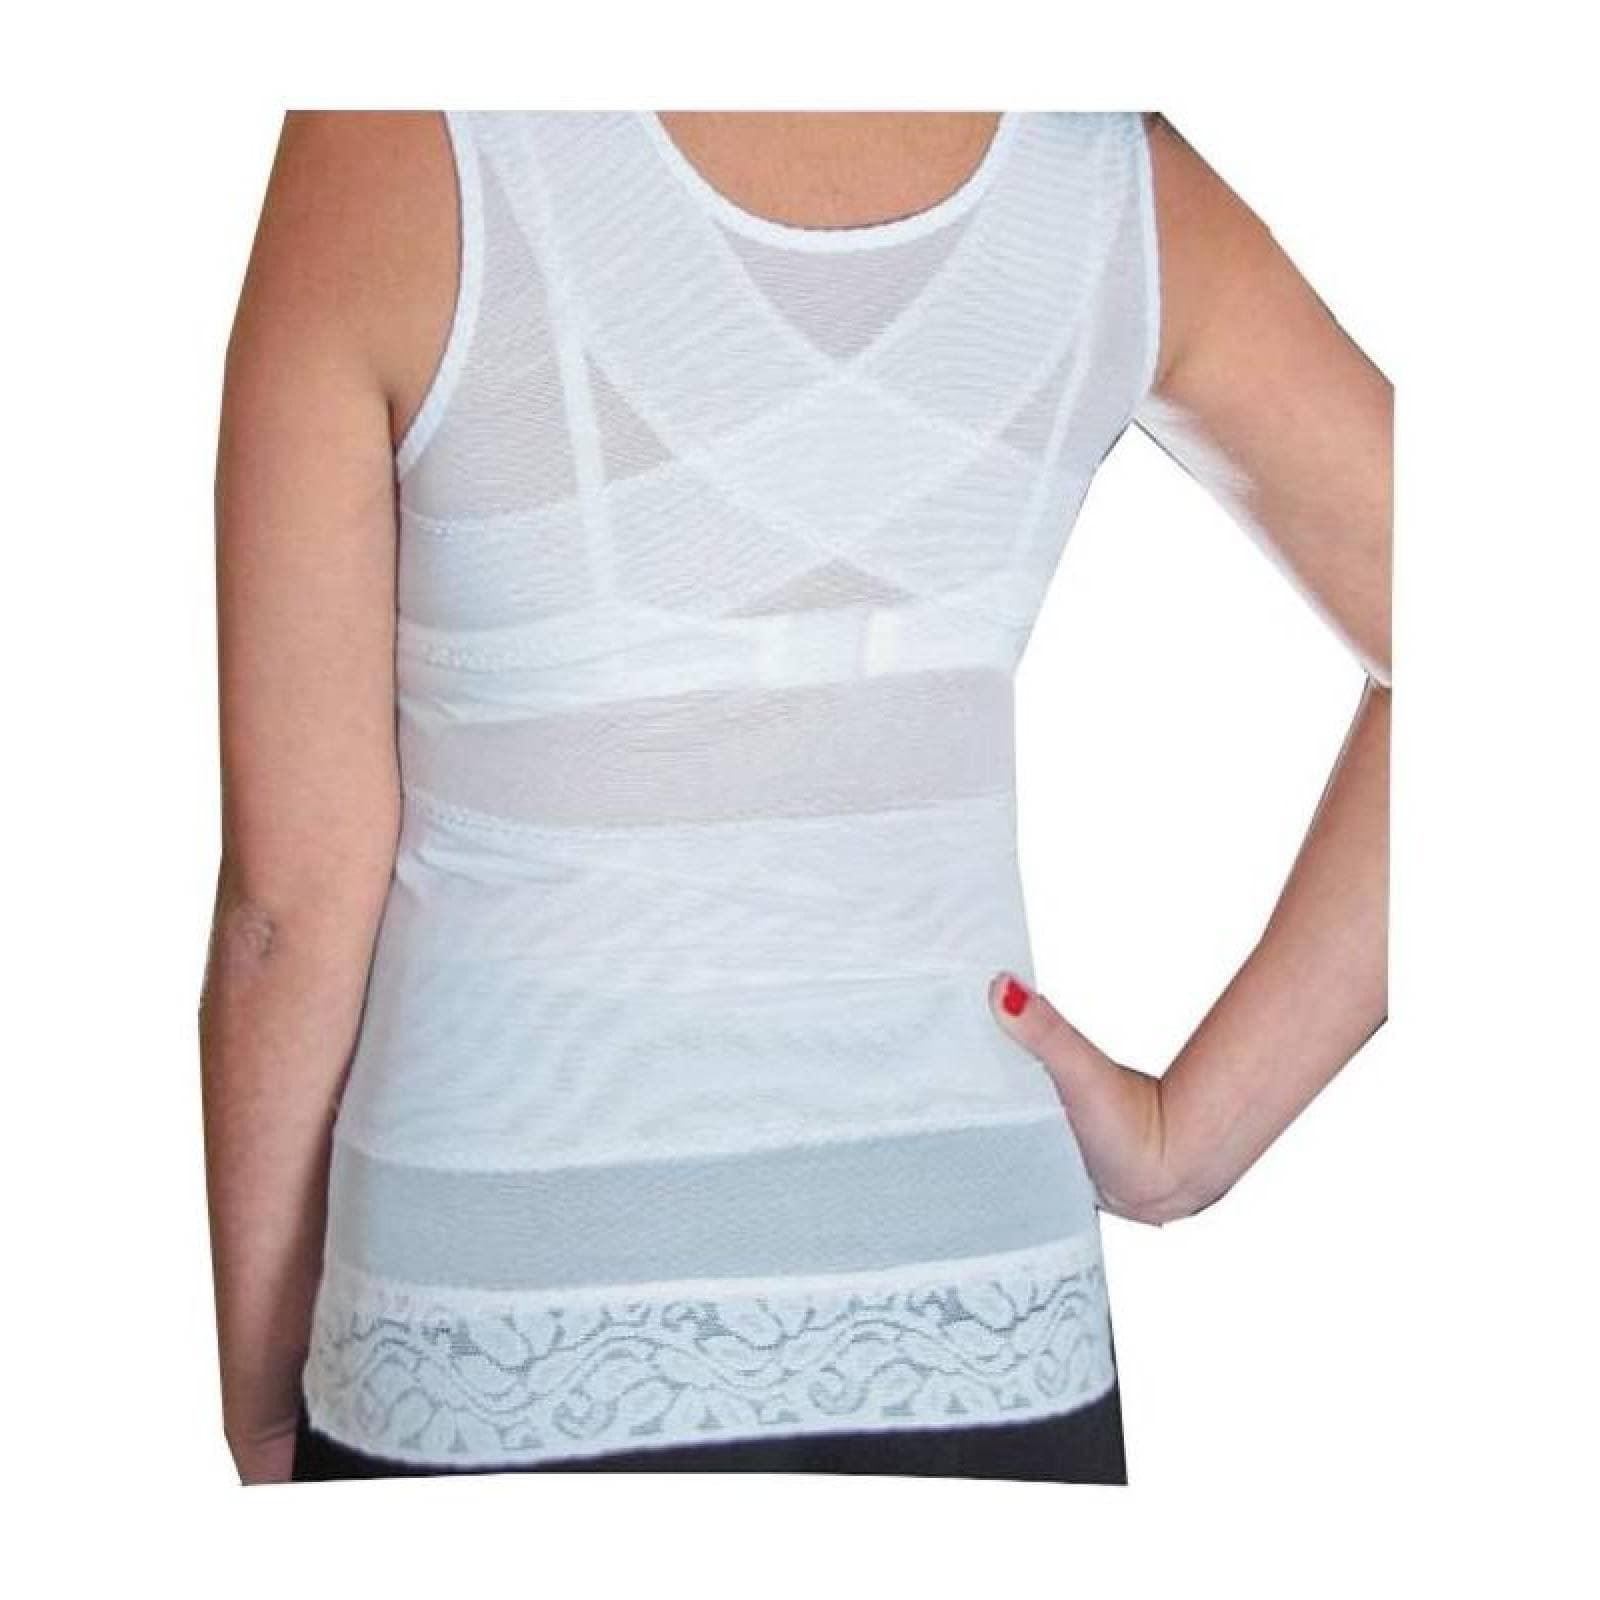 Camiseta Modeladora Blanca